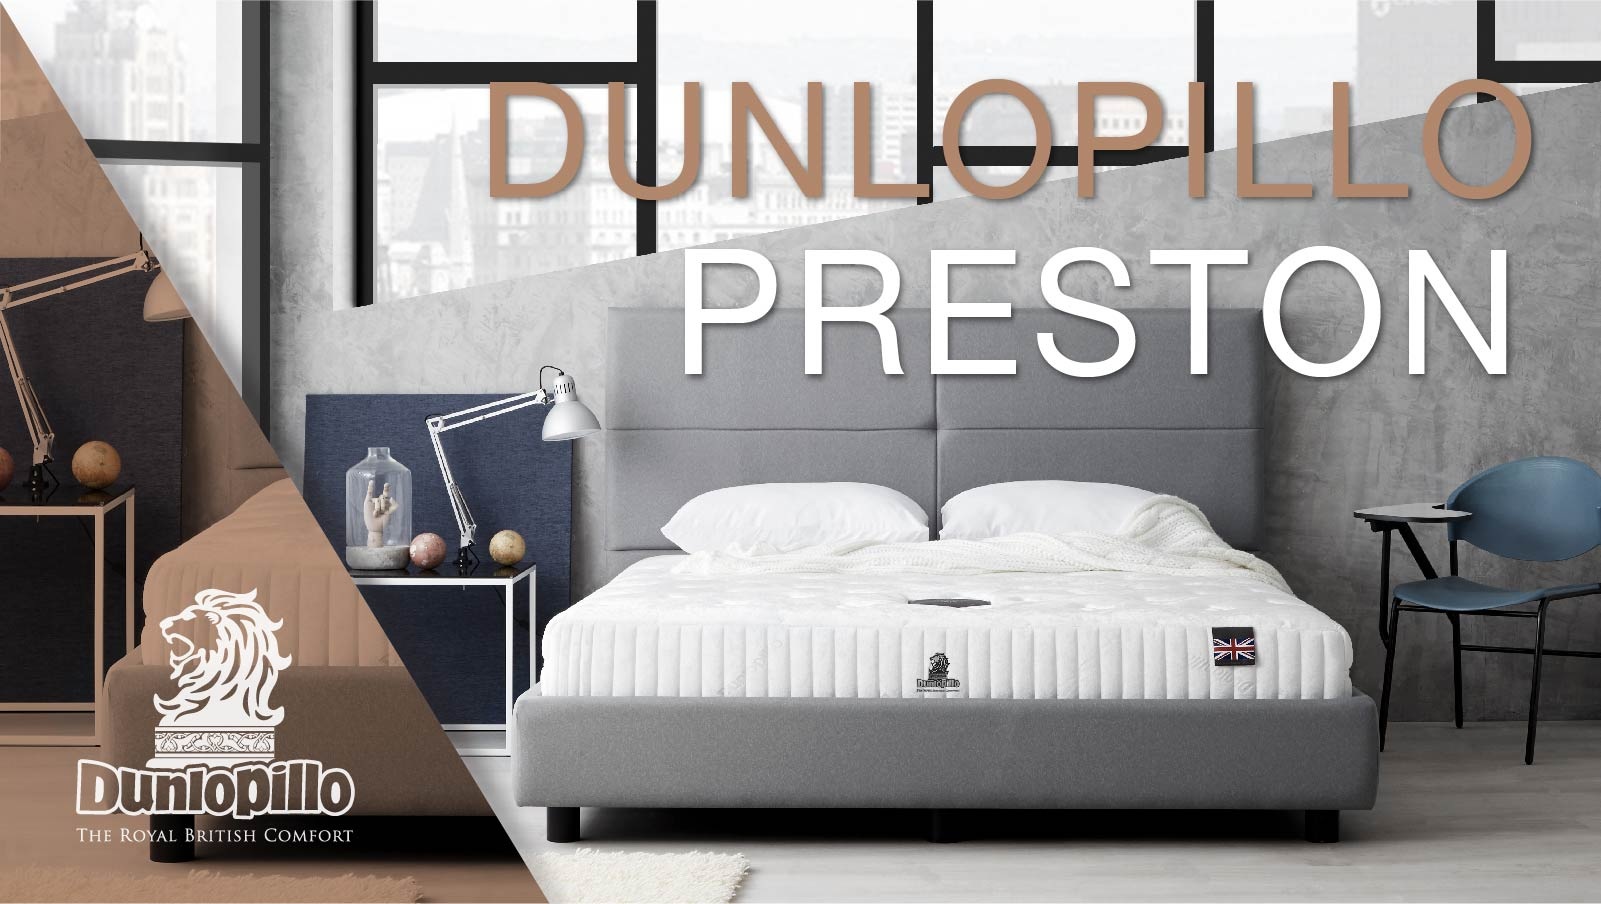 Dunlopillo Mattress - Preston